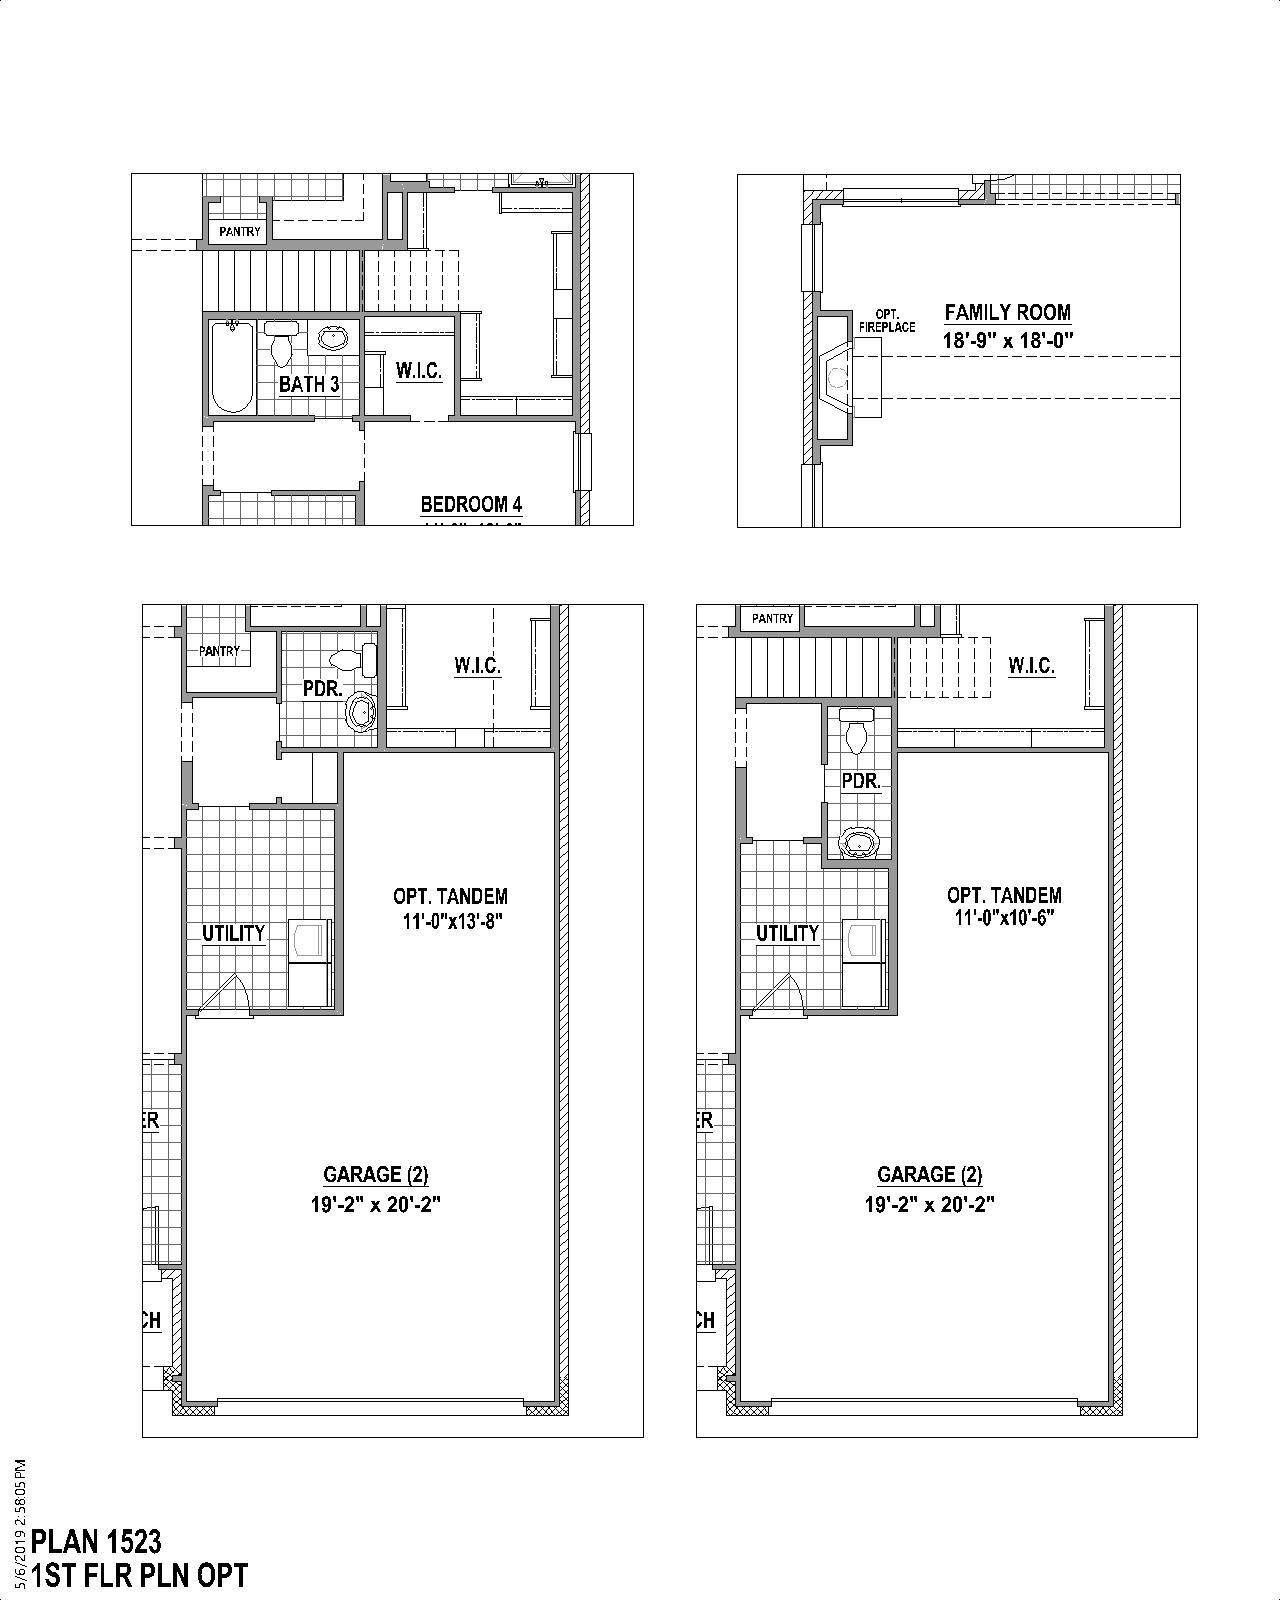 Plan 1523 Floor Plan